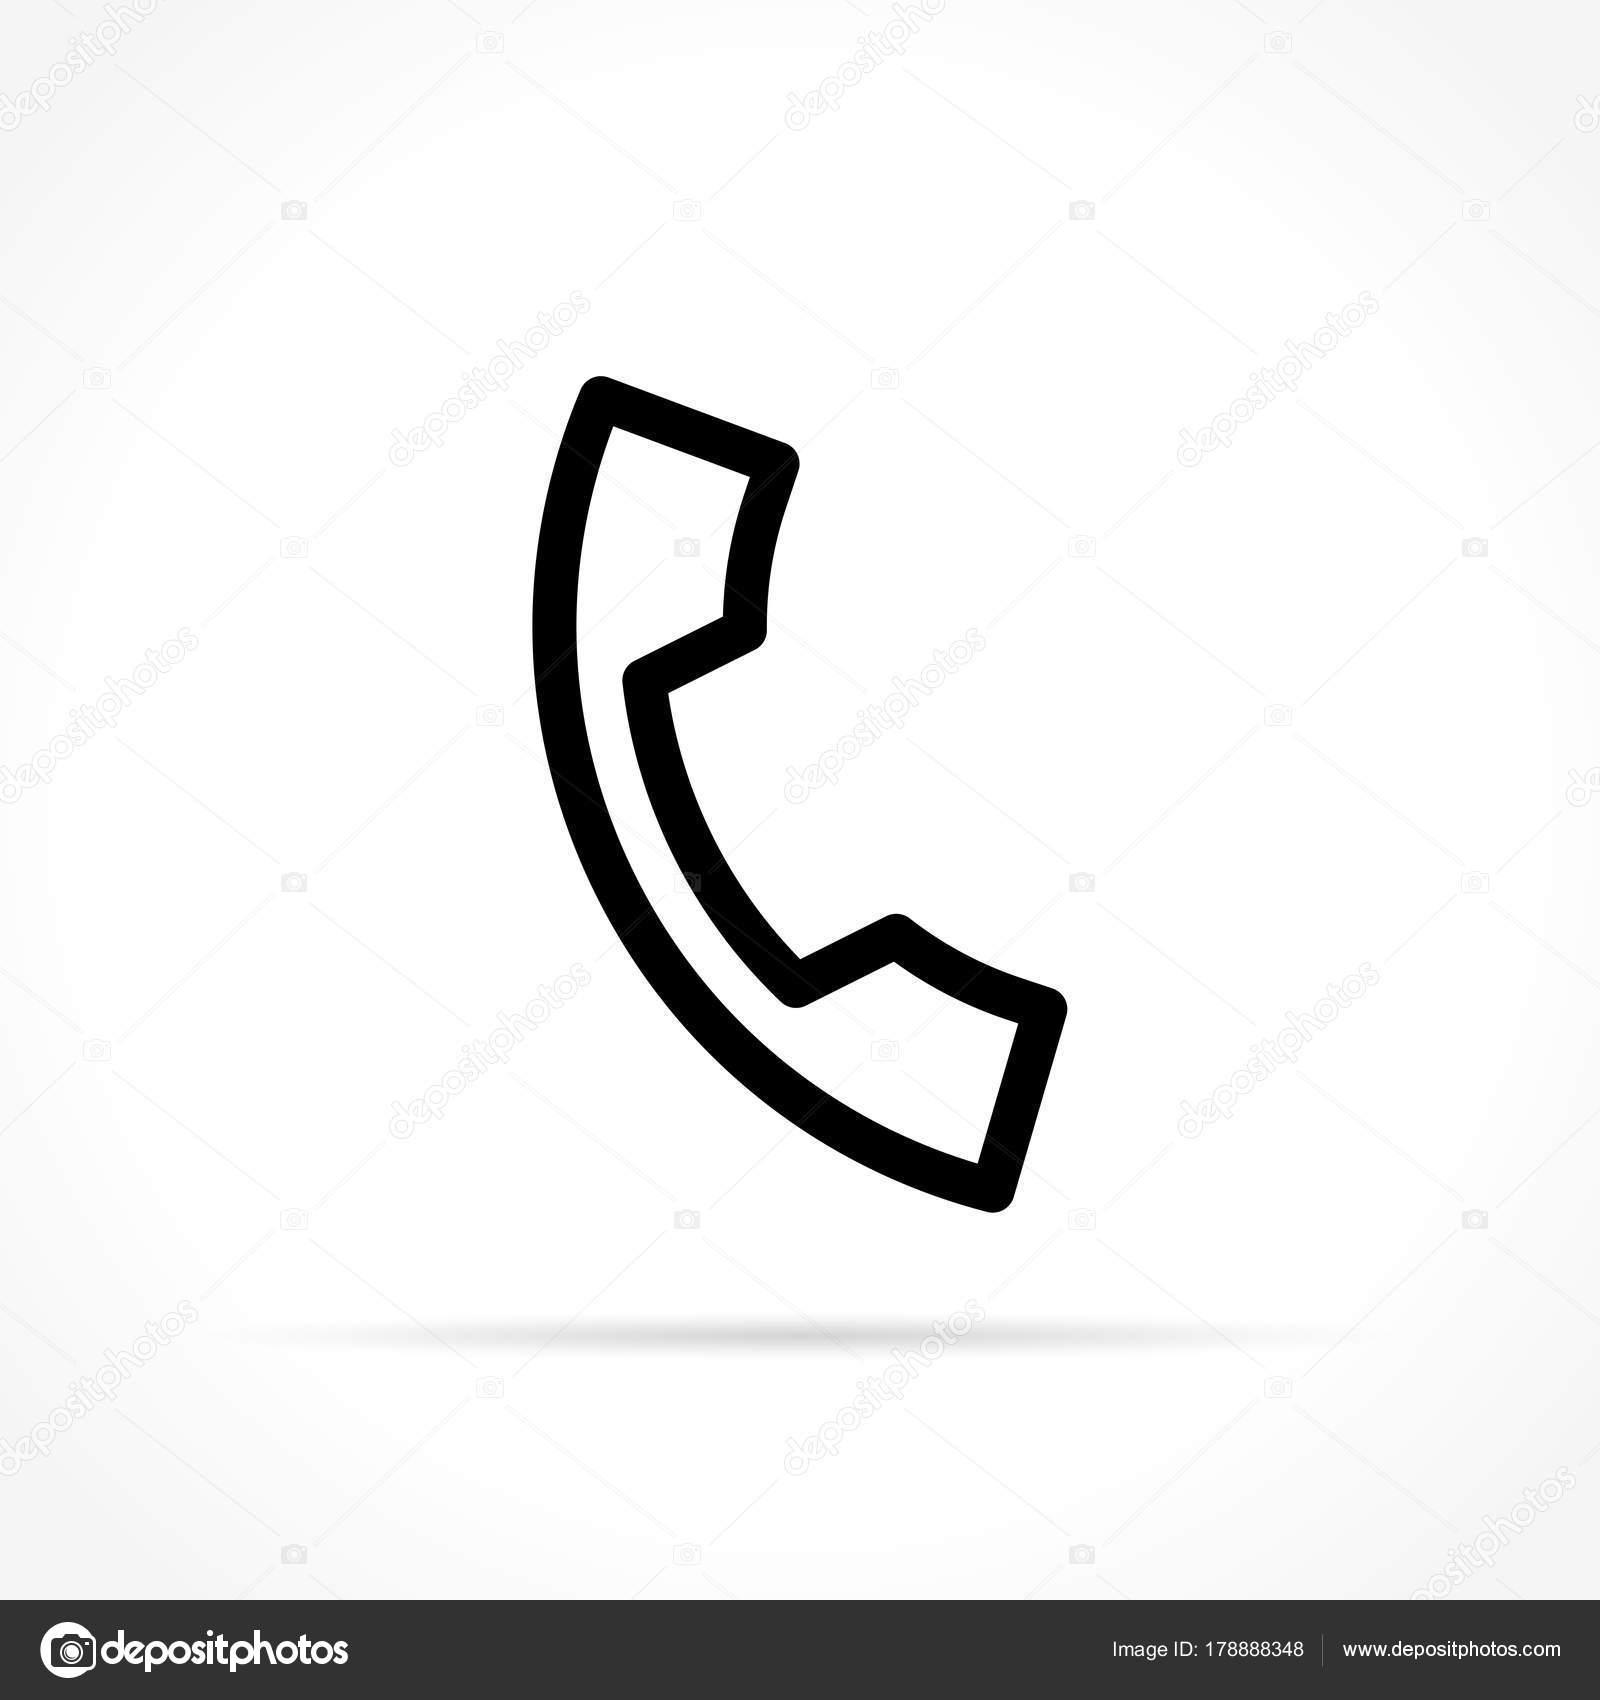 Icona Telefono Su Sfondo Bianco Vettoriali Stock Nickylarson